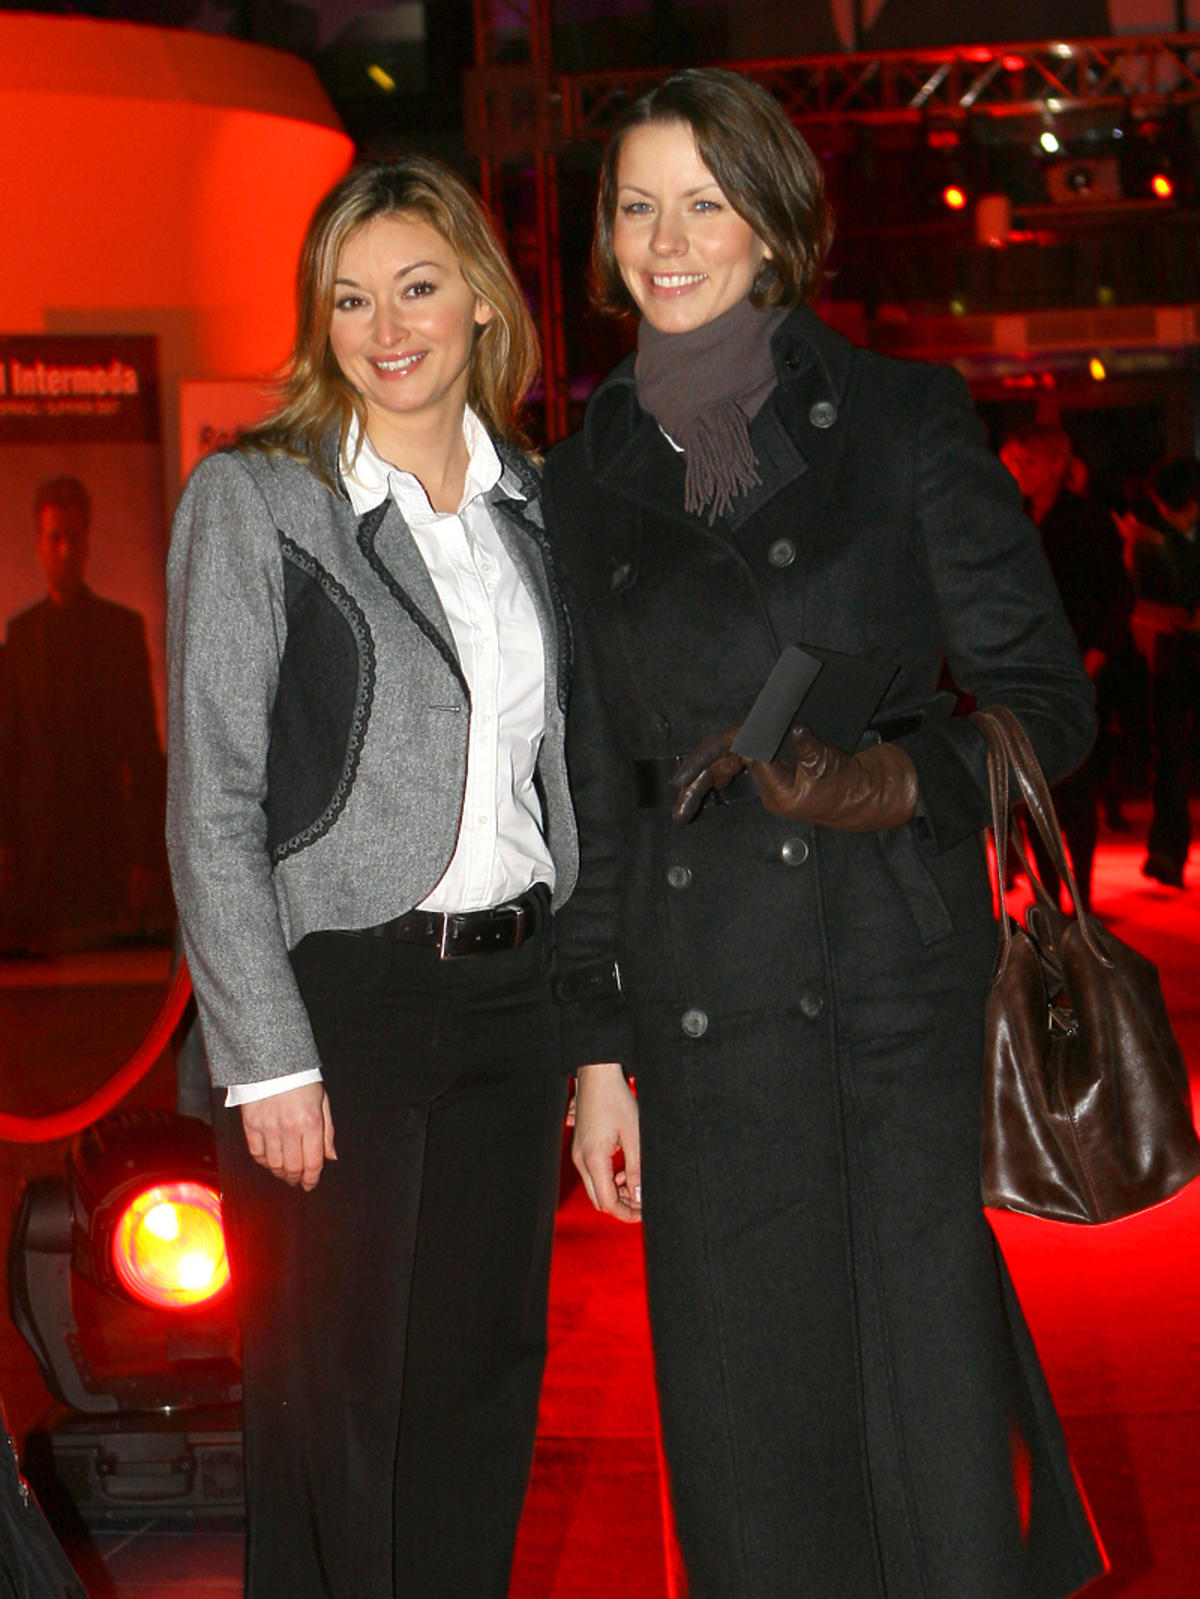 Anita Werner i Martyna Wojciechowska